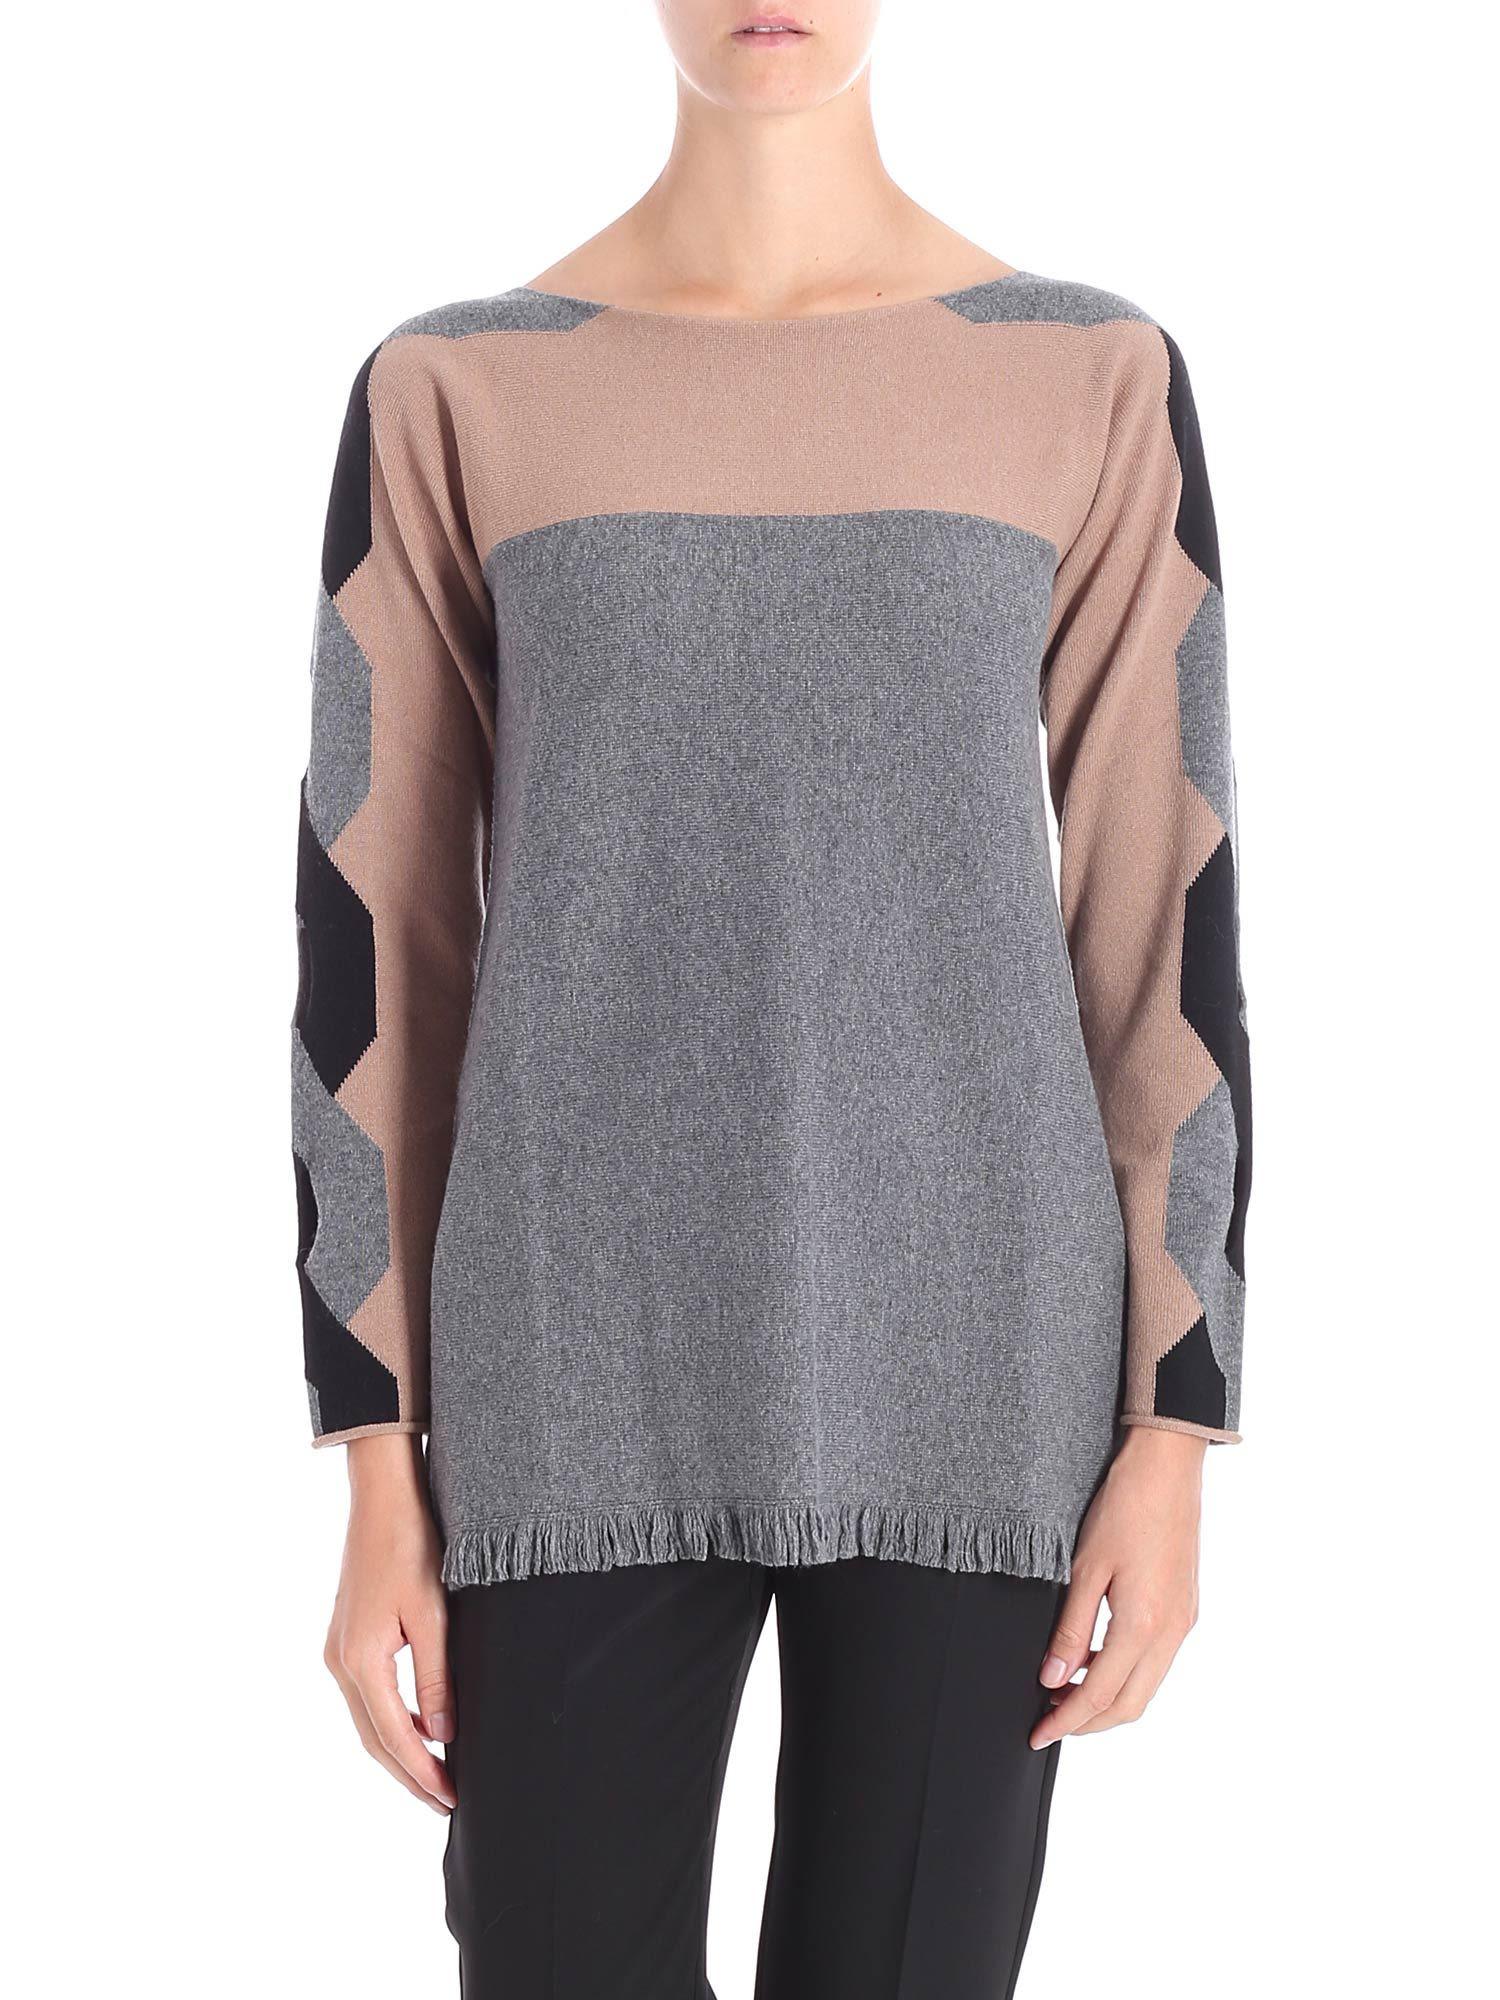 KANGRA Fringed Hem Sweater in Cammello/Grigio